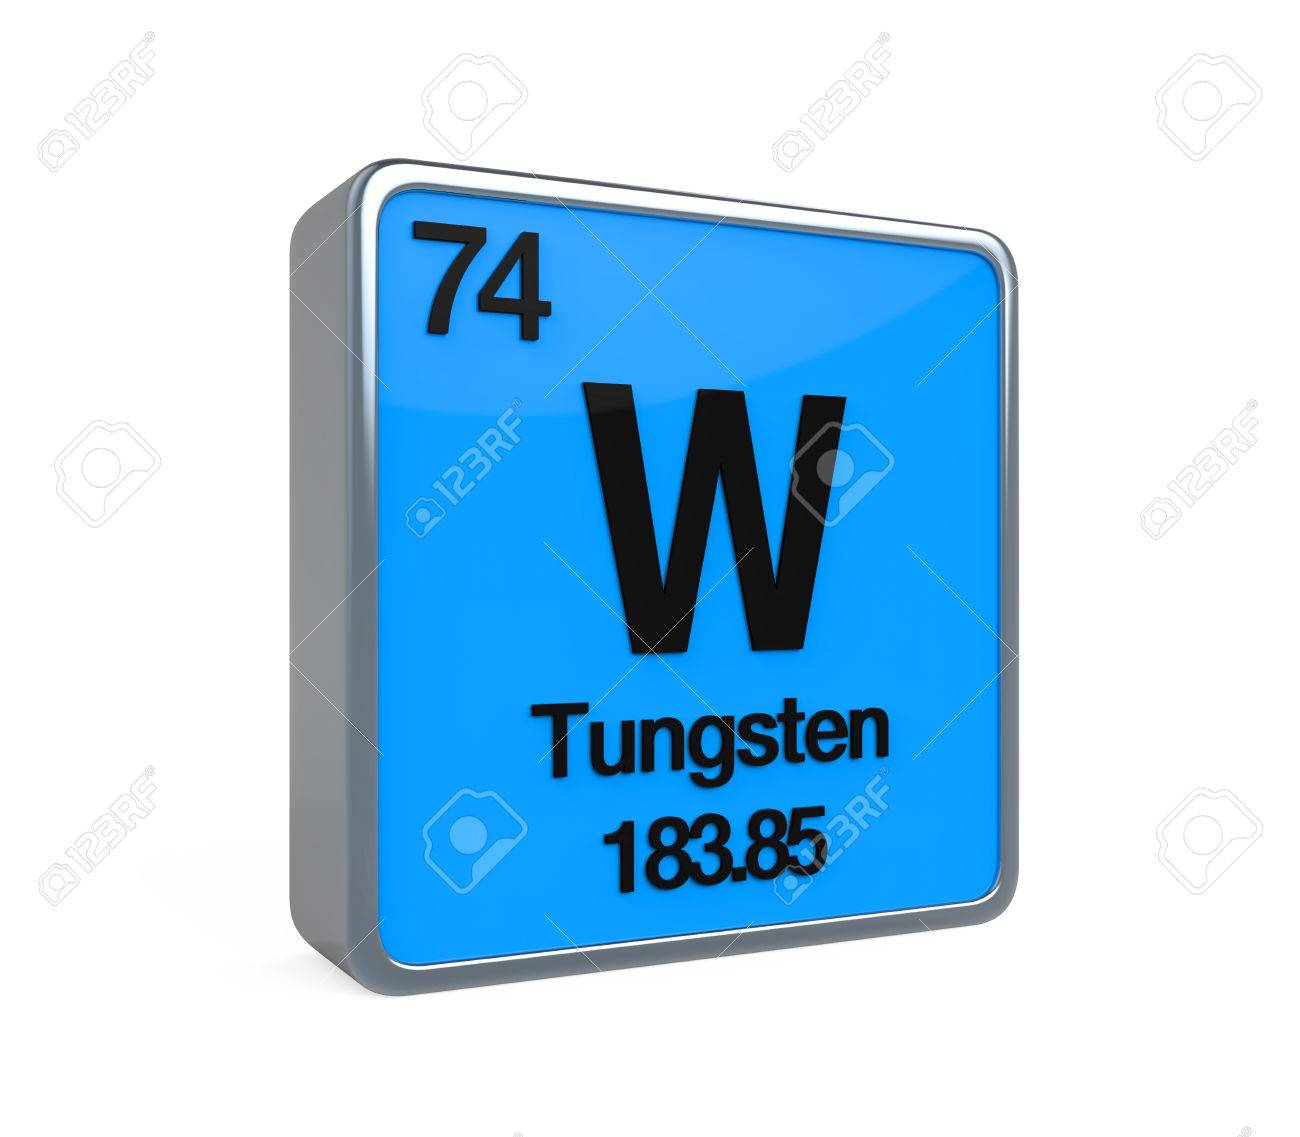 Tungsten element periodic table stock photo picture and royalty stock photo tungsten element periodic table urtaz Gallery